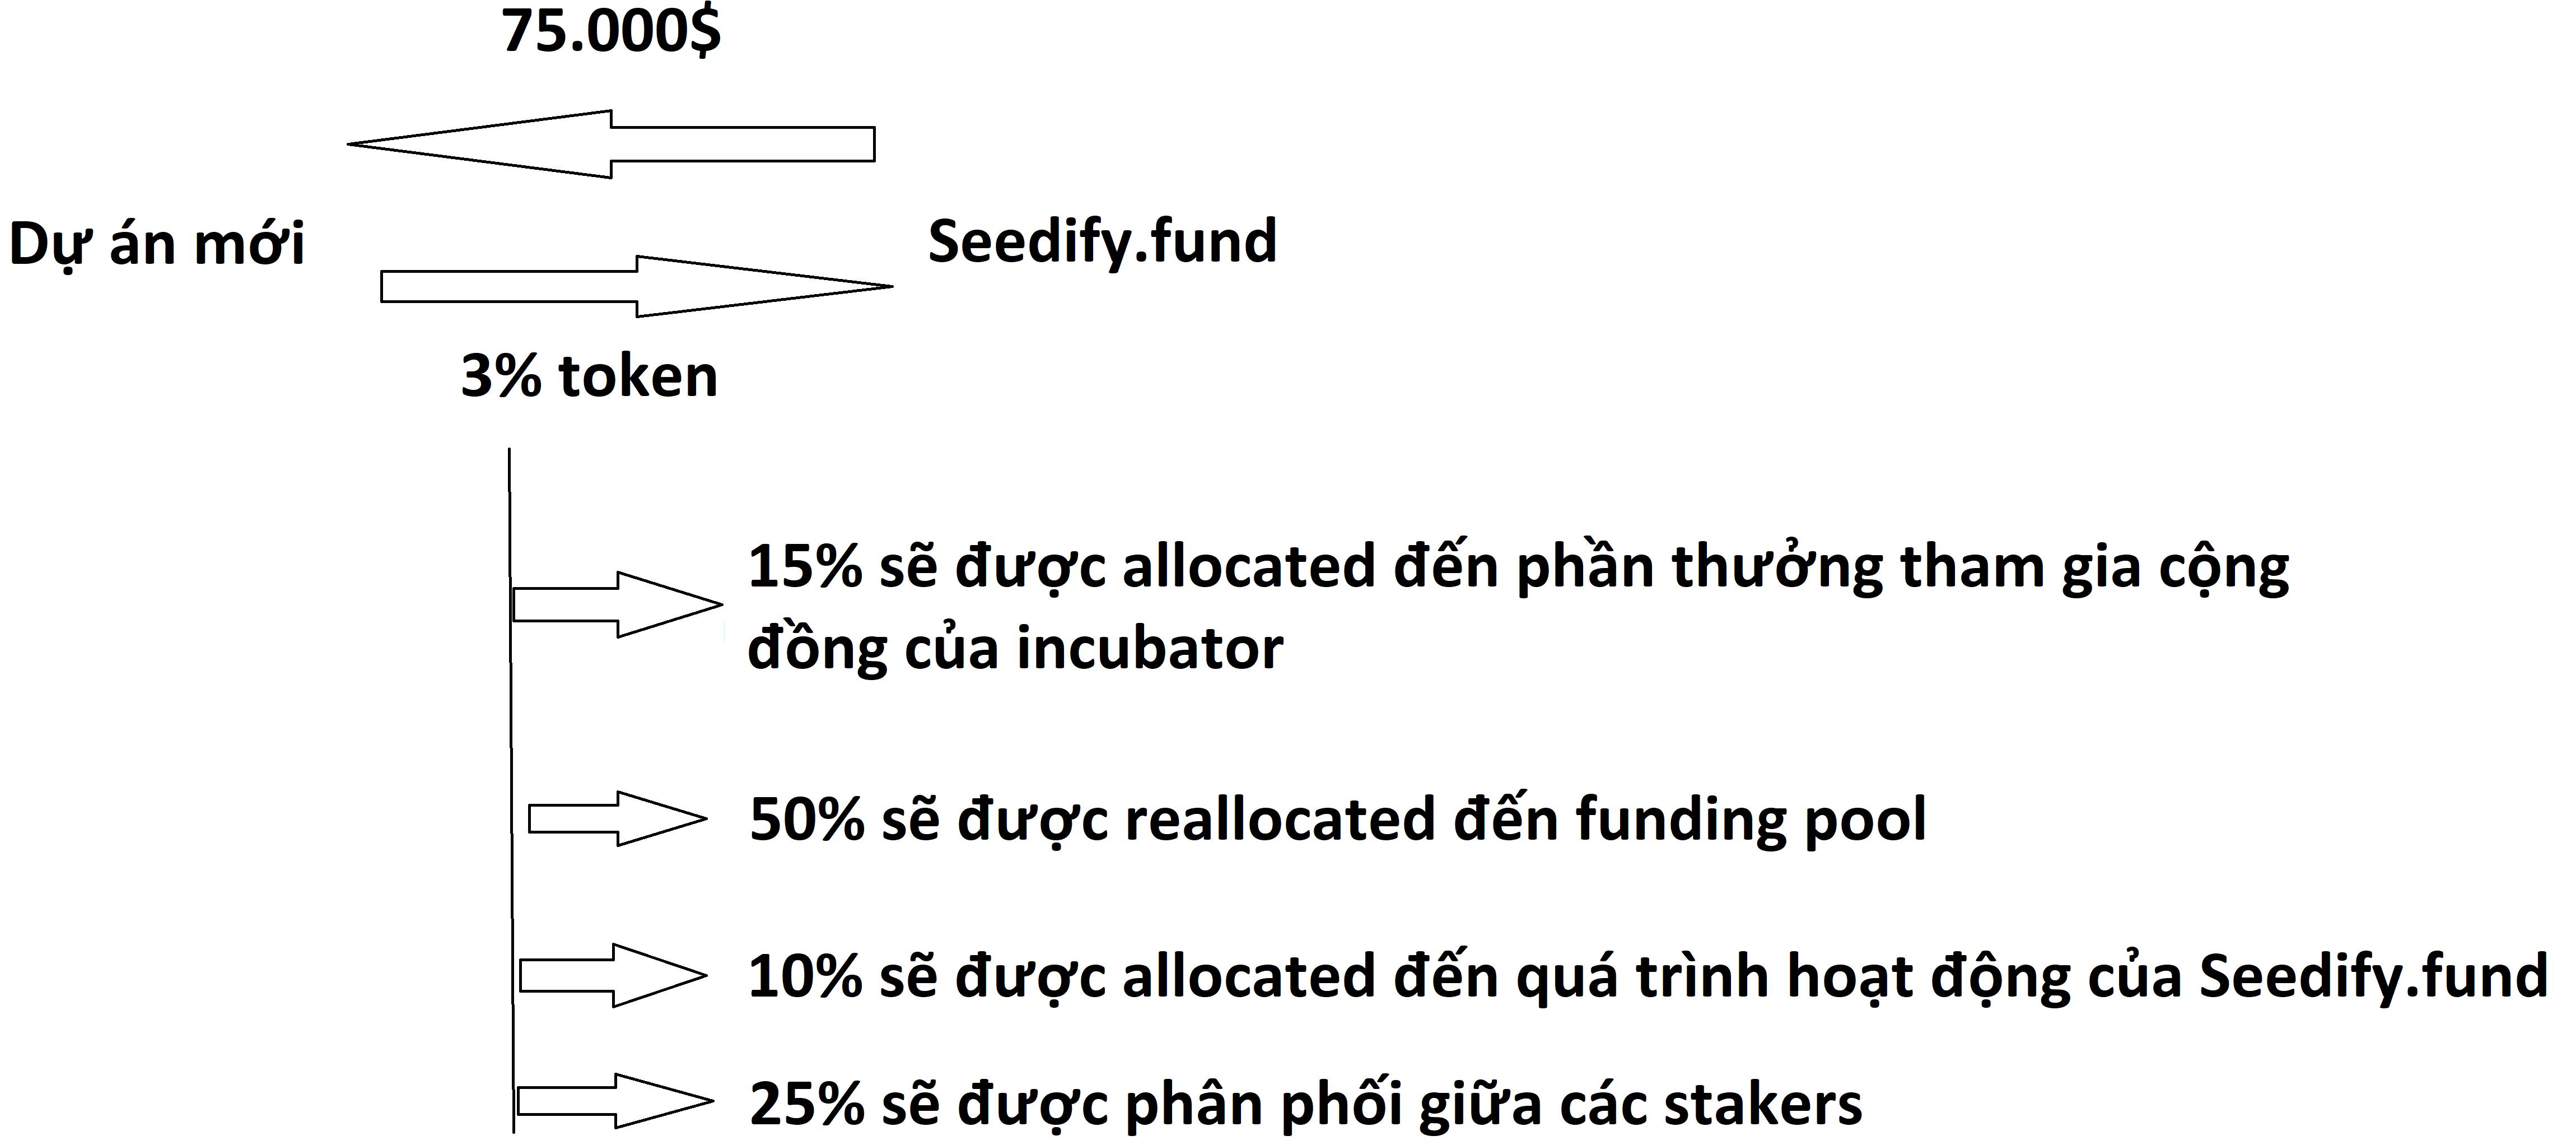 Funding pool 2